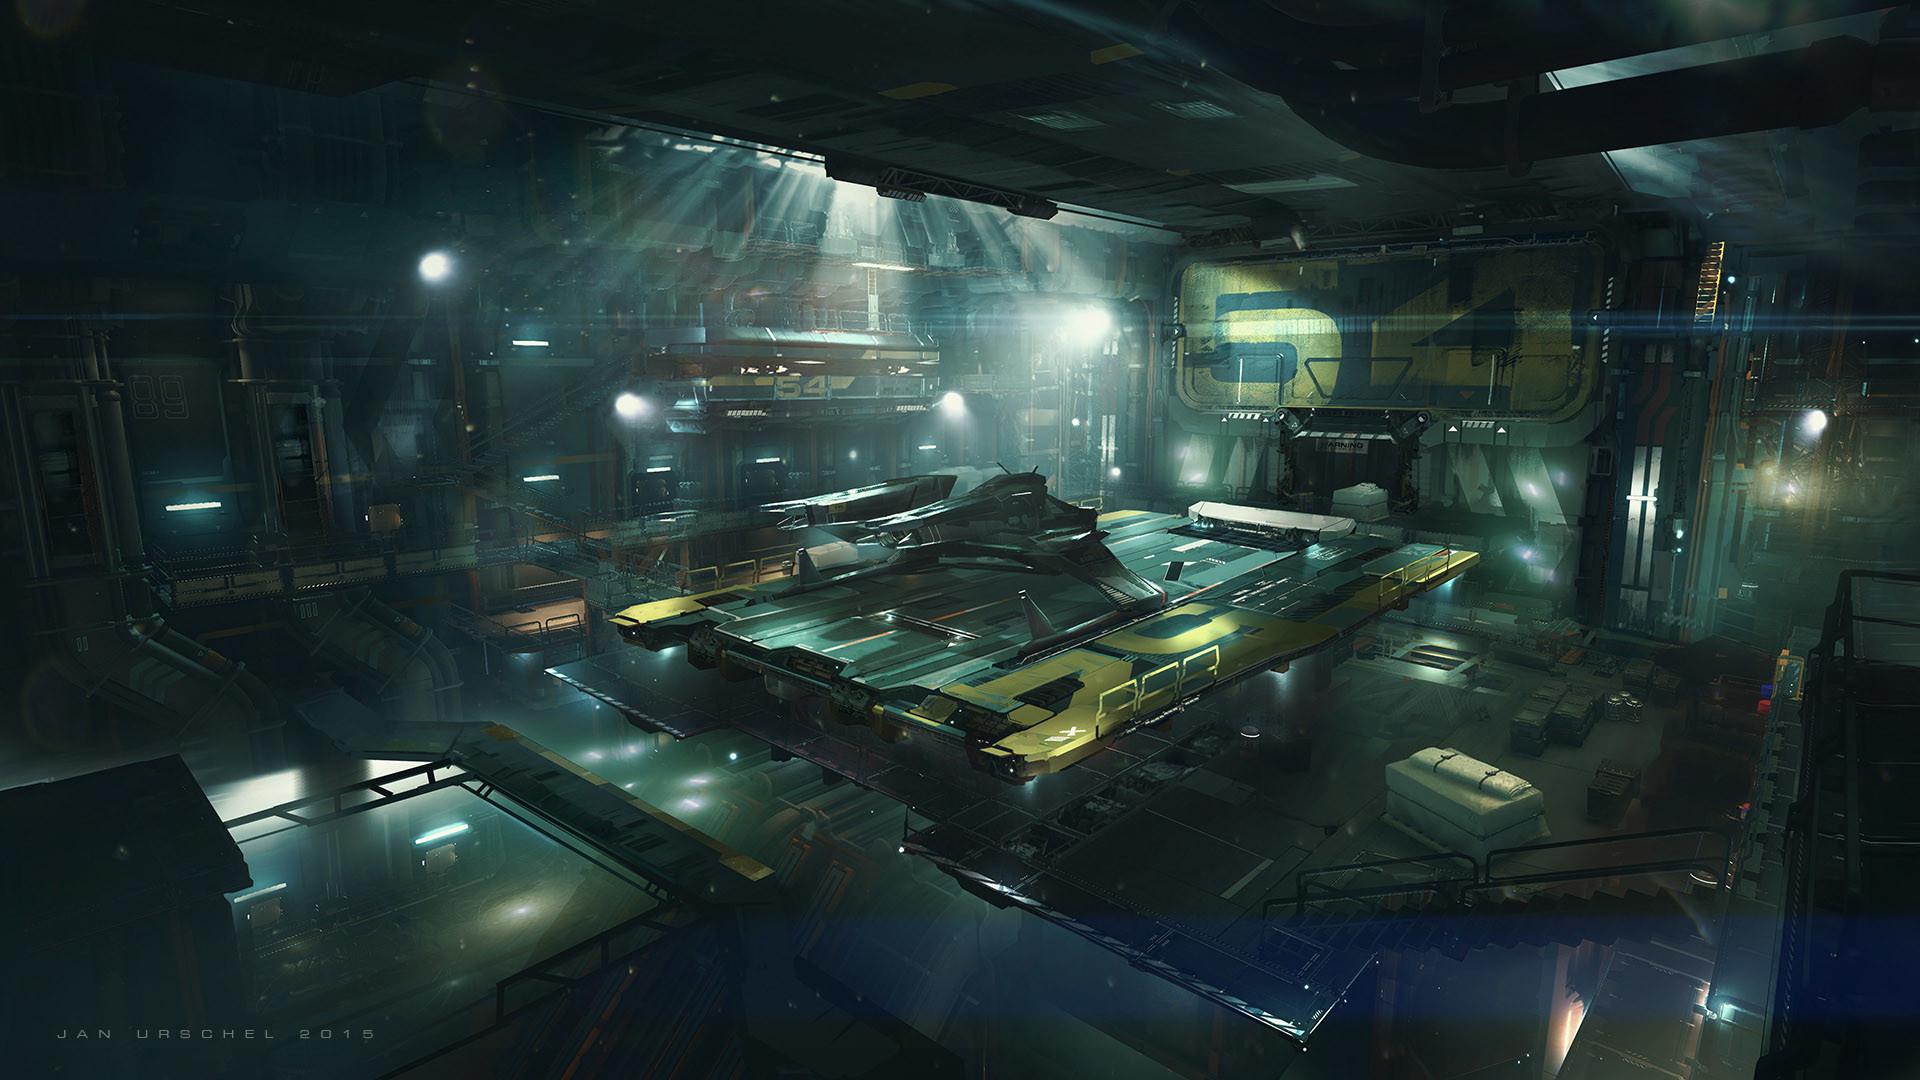 Sci Fi Hangar Concept Art